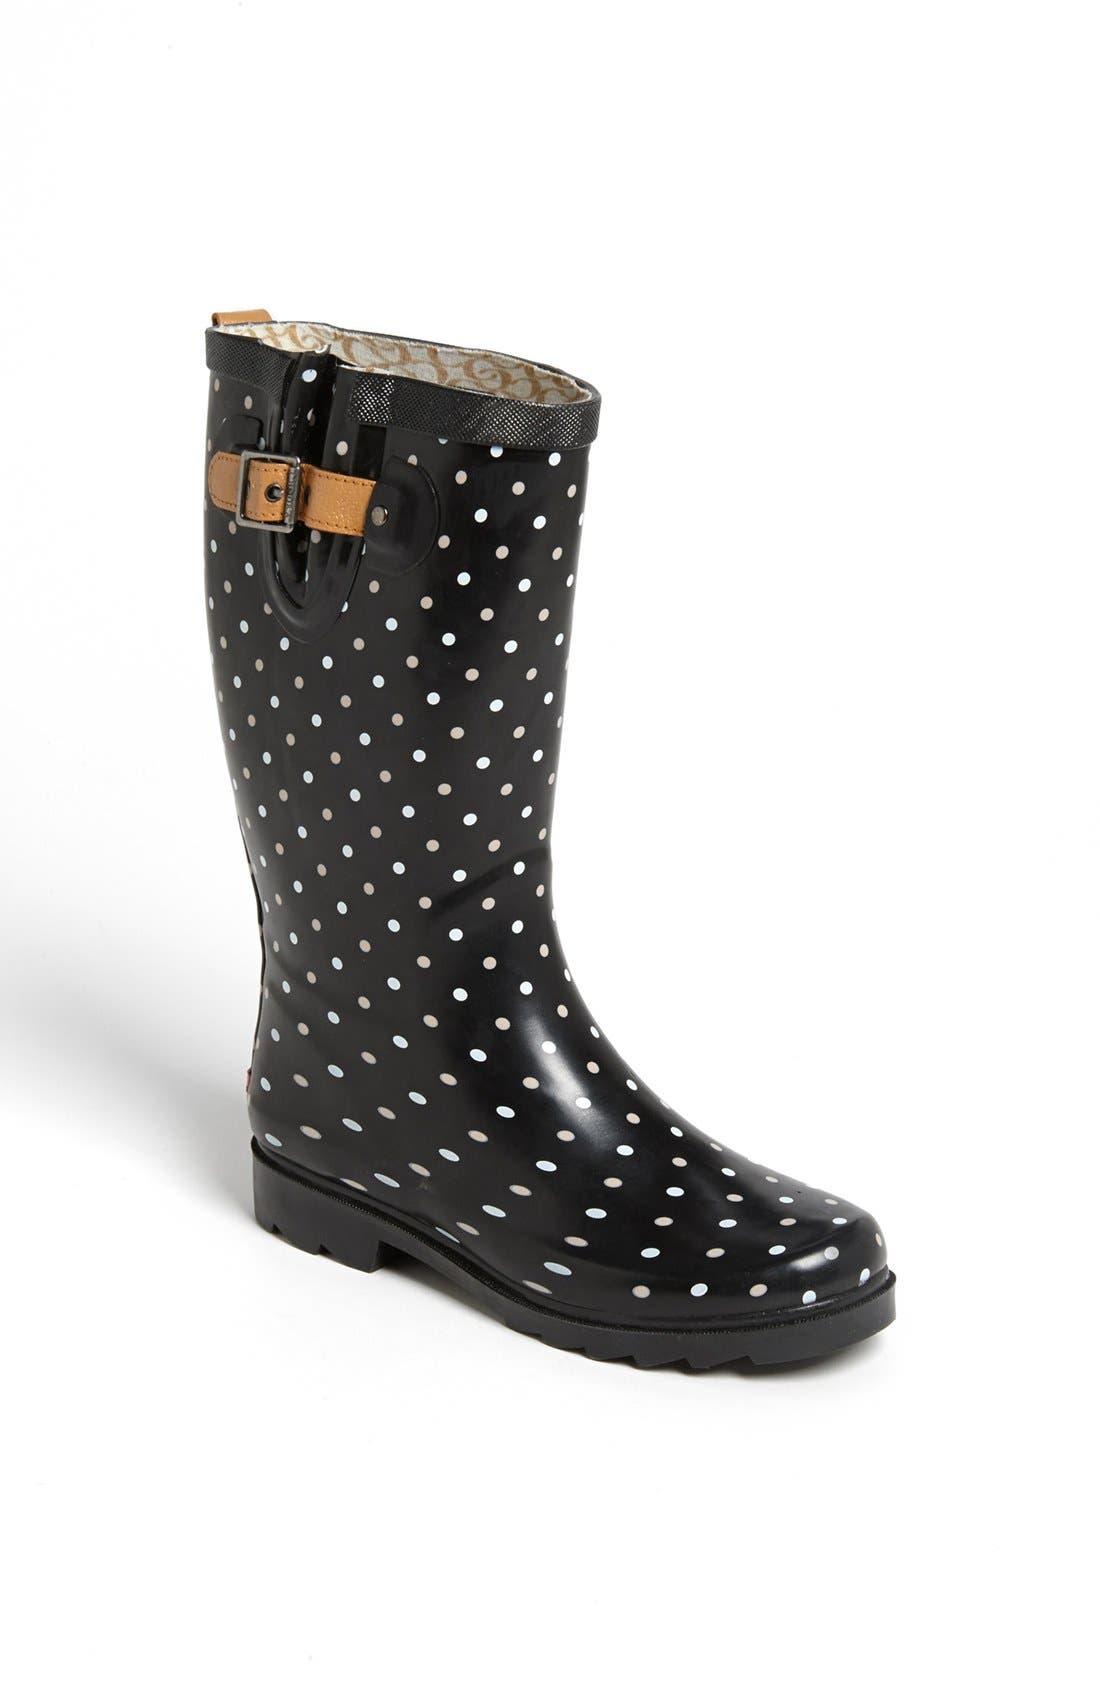 Alternate Image 1 Selected - Chooka 'Classical Dot' Rain Boot (Women)